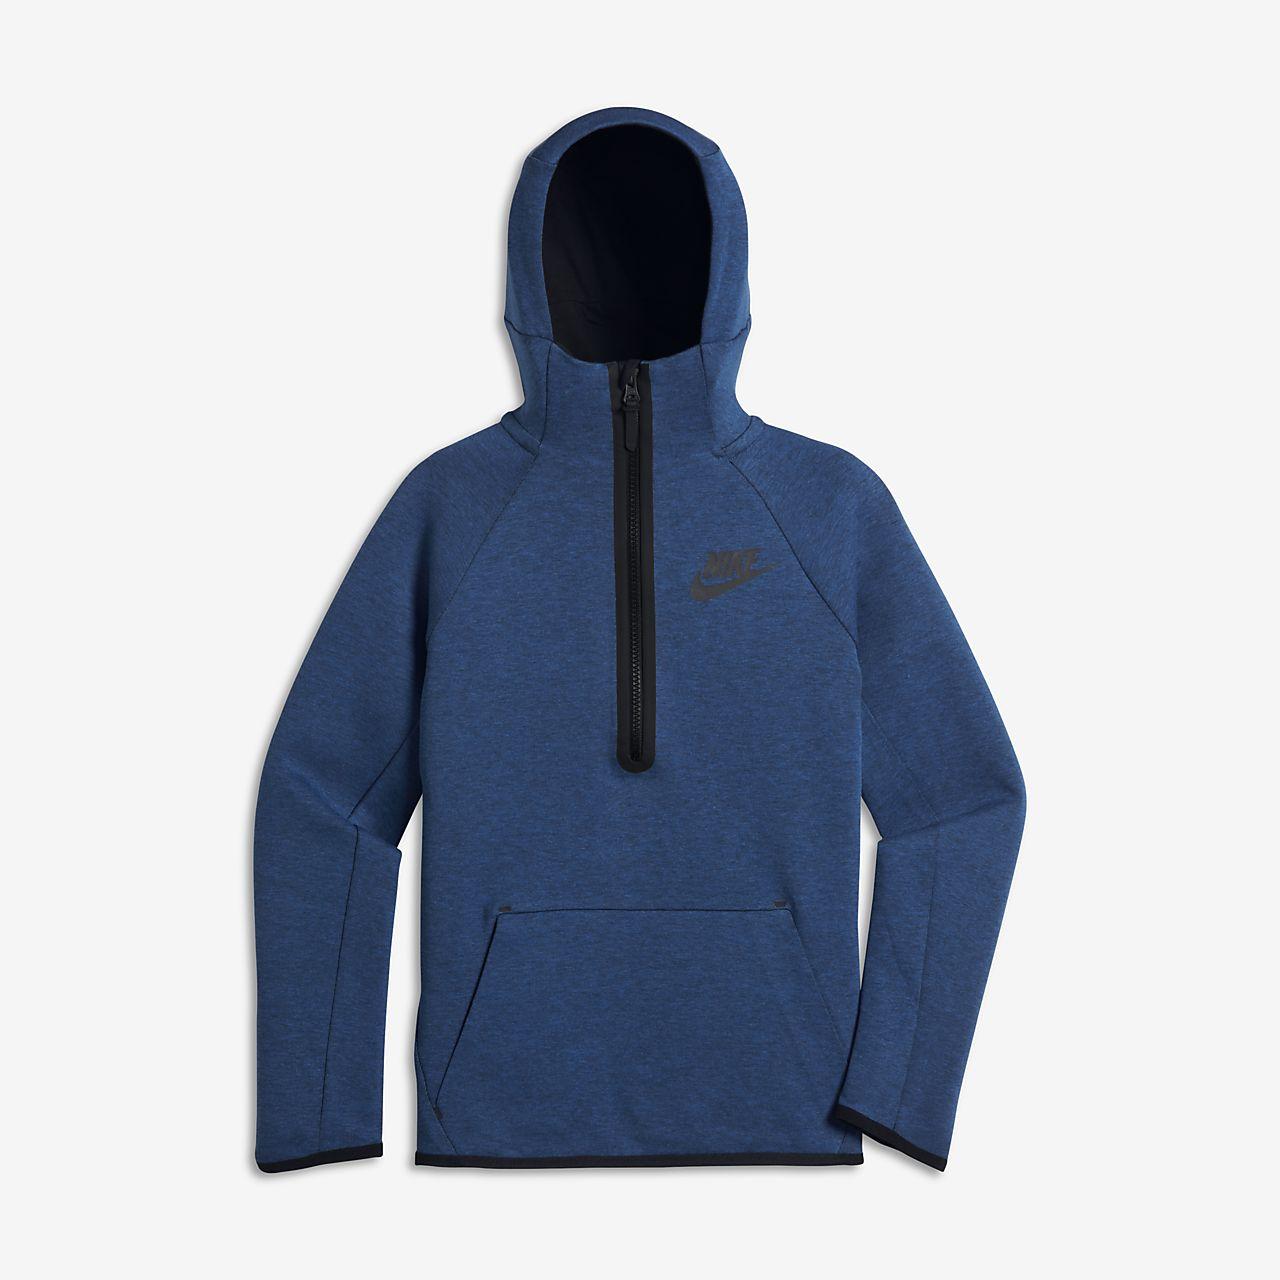 Nike Sportswear Tech Fleece Hoodie für ältere Kinder (Jungen)